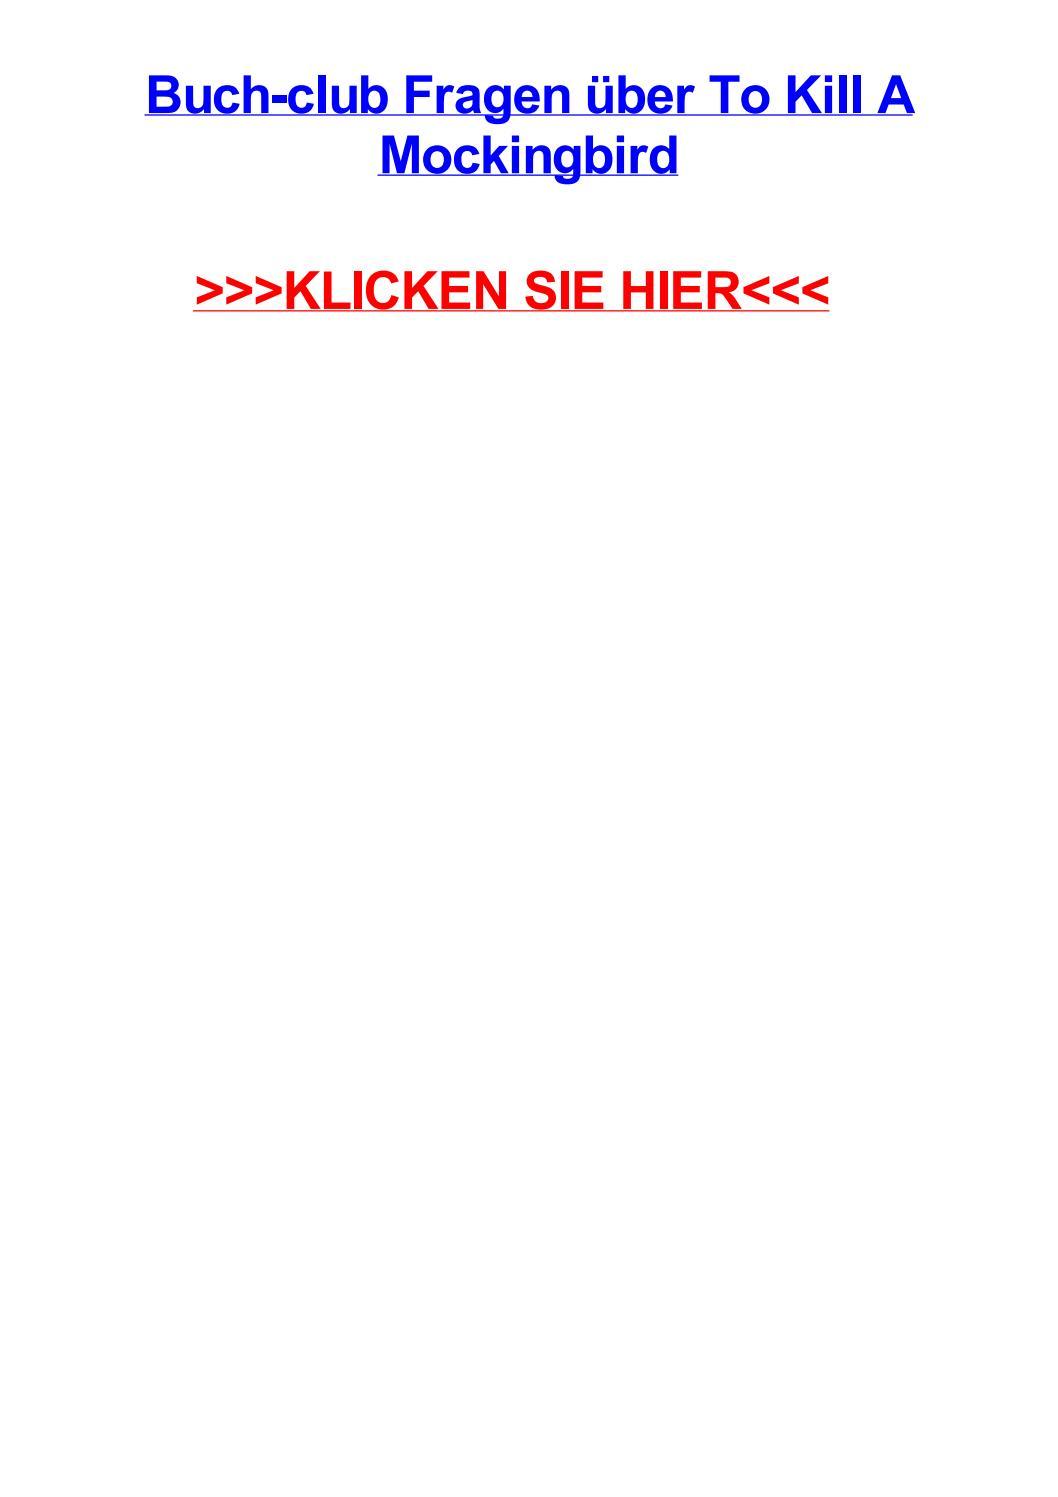 Buch club fragen jber to kill a mockingbird by christopherhivz - issuu